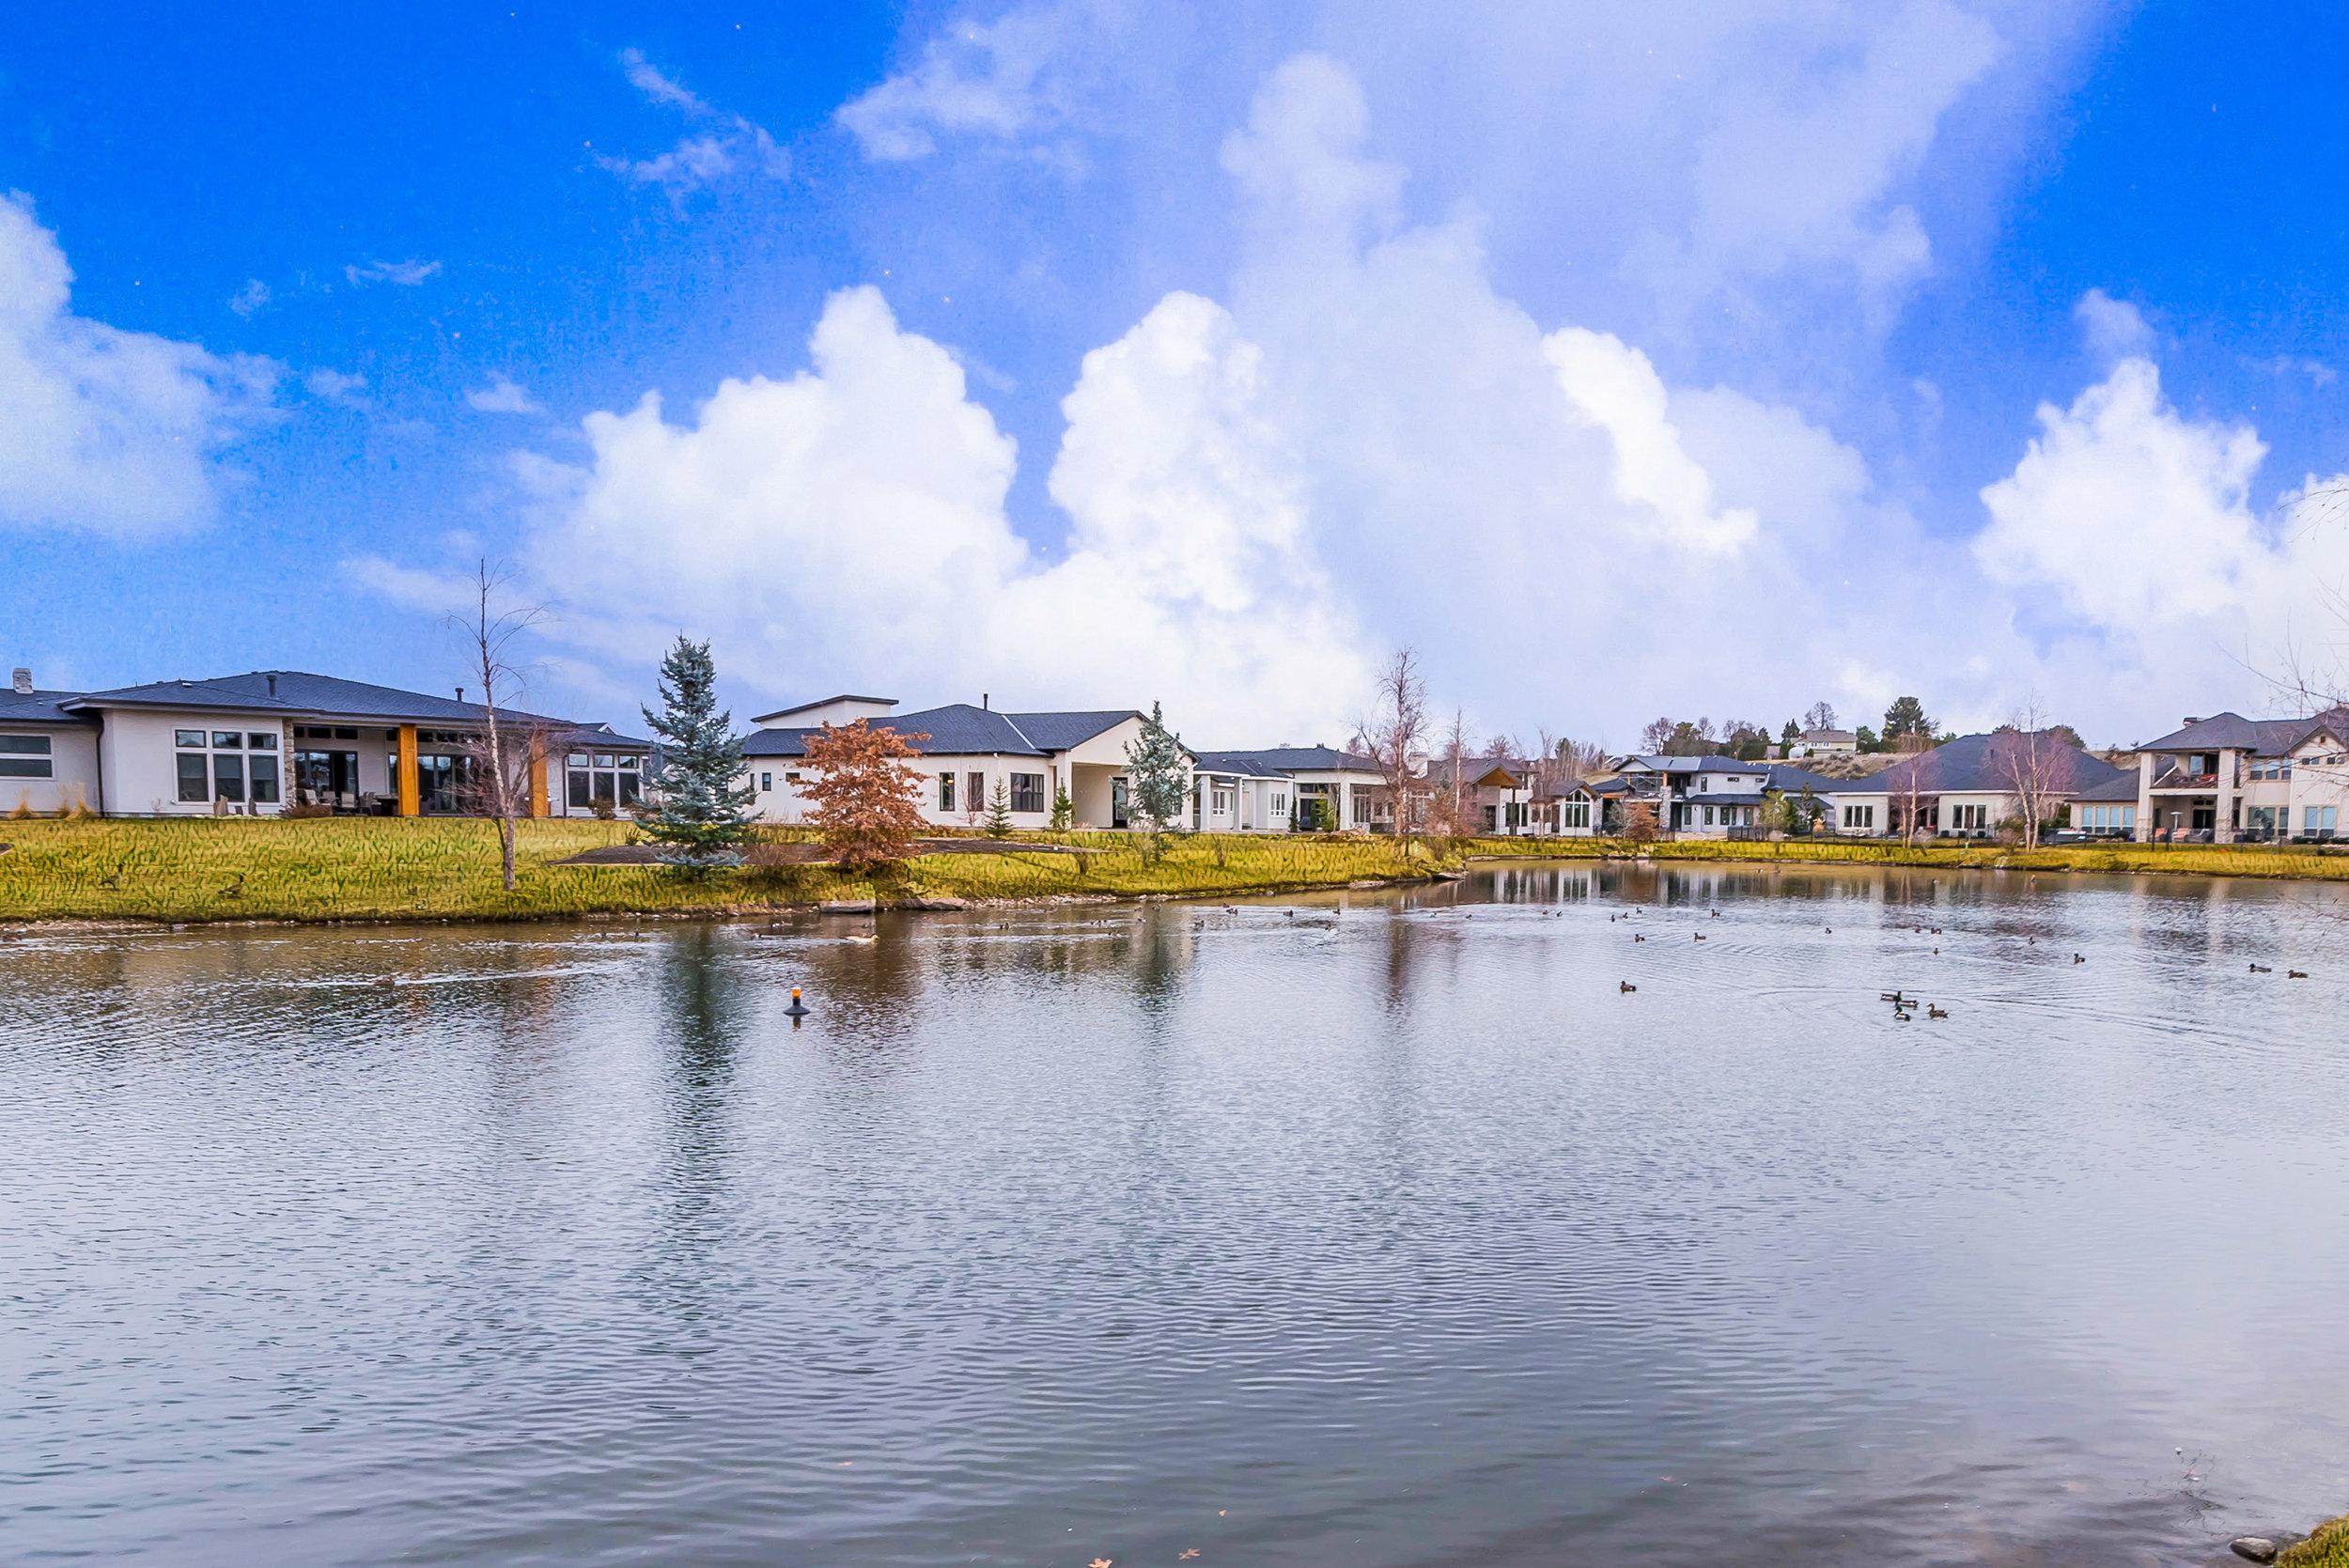 62-Pond_View(1).jpg